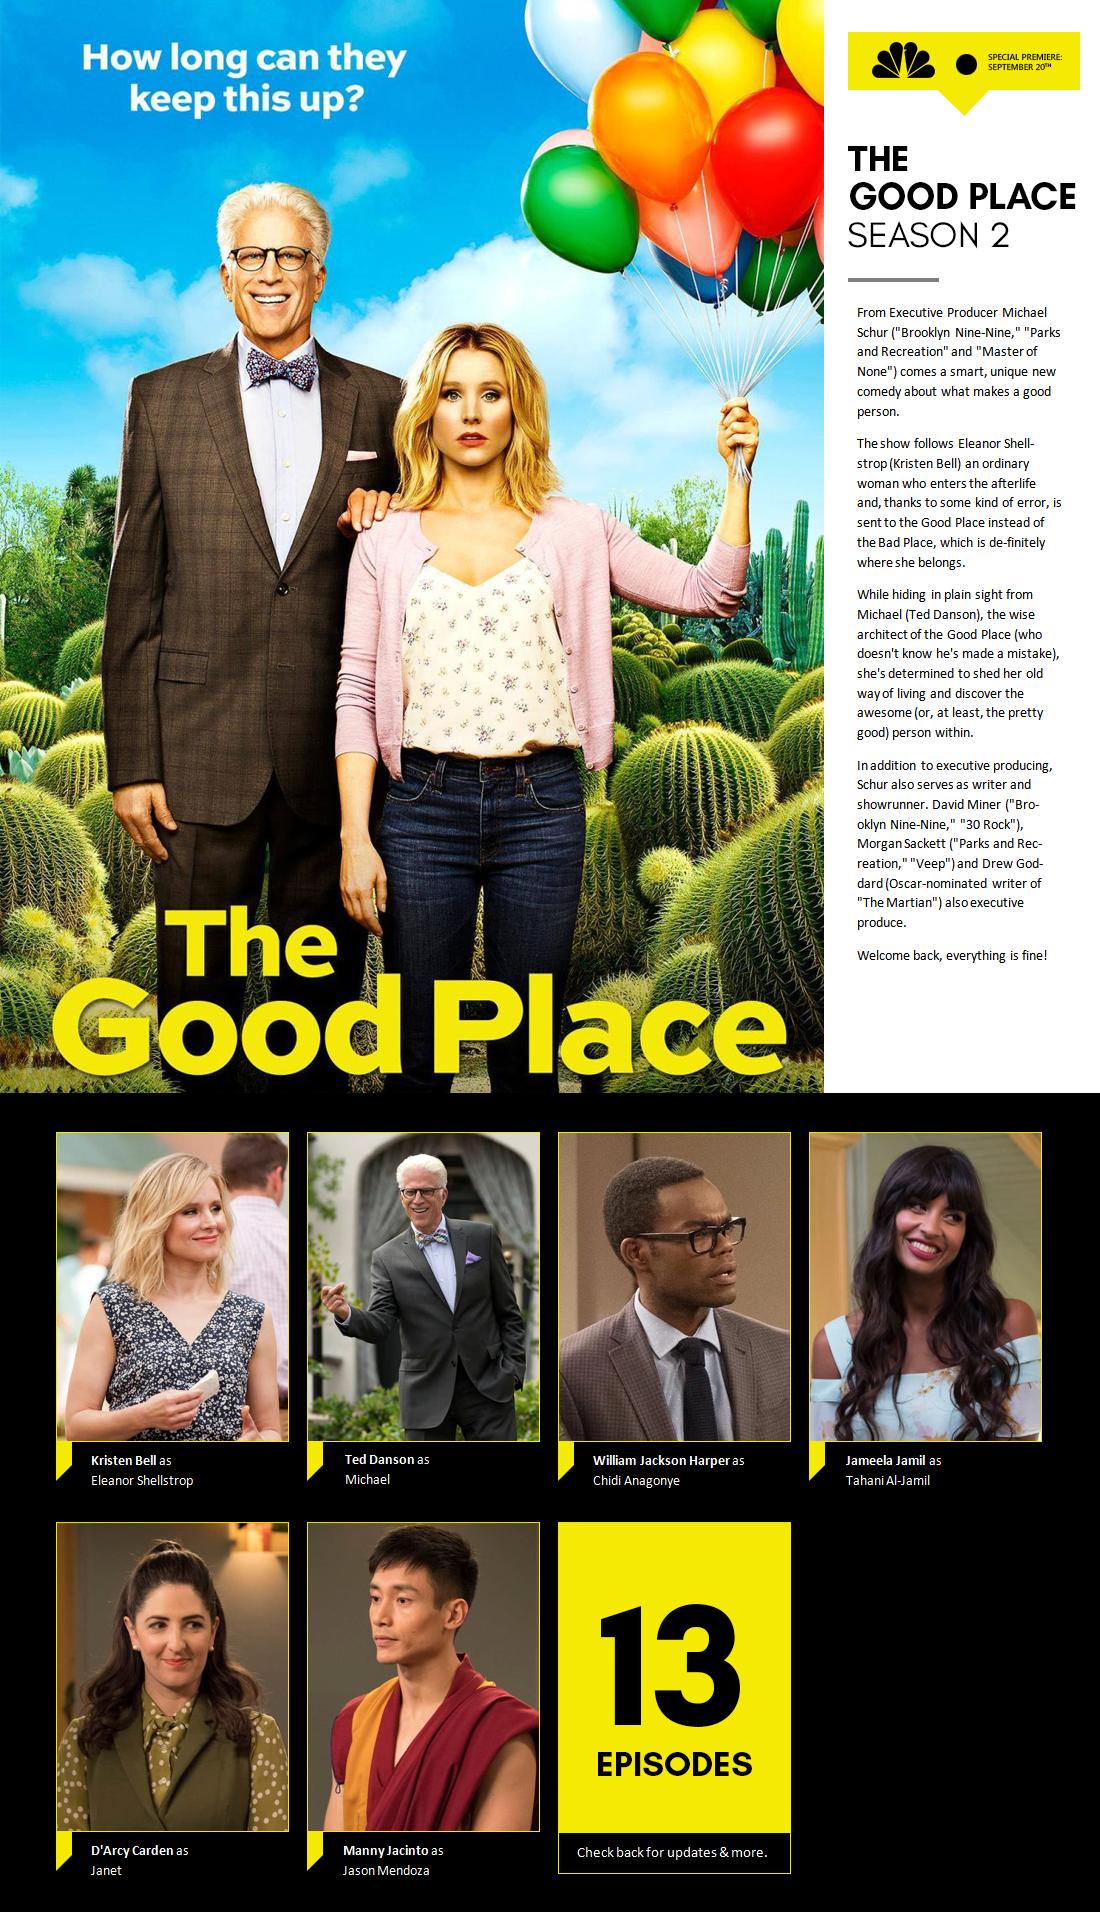 The Good Place S2  OT  Well, Fork Me - Thursdays 8:30/7:30c